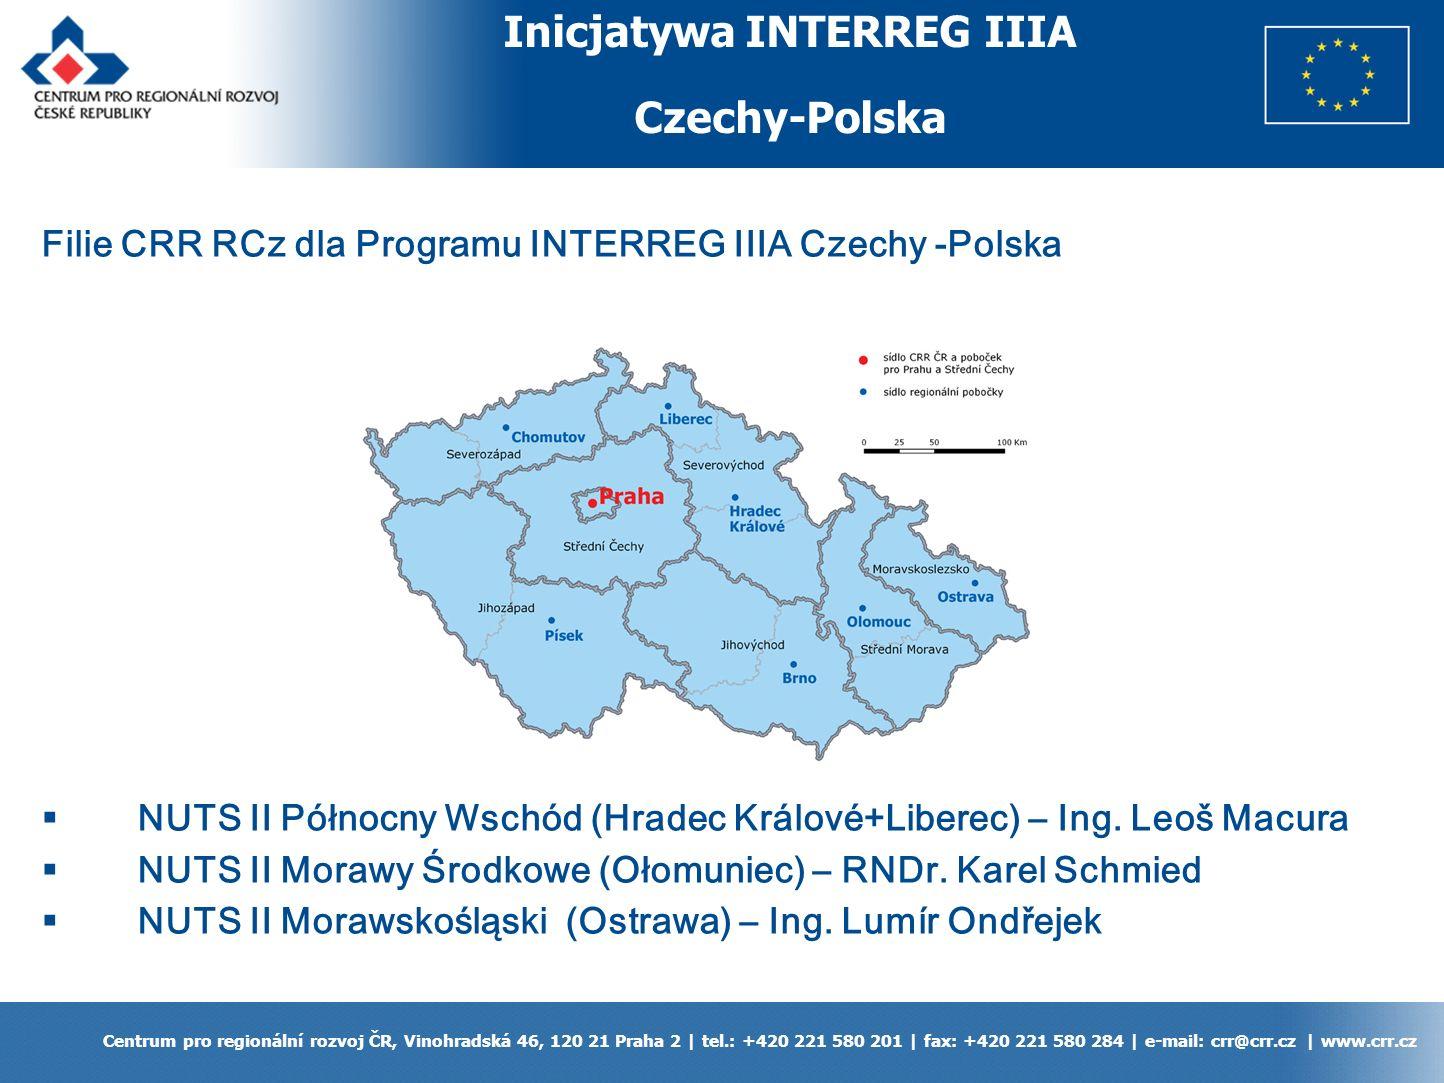 Inicjatywa INTERREG IIIA Czechy-Polska Centrum pro regionální rozvoj ČR, Vinohradská 46, 120 21 Praha 2 | tel.: +420 221 580 201 | fax: +420 221 580 284 | e-mail: crr@crr.cz | www.crr.cz Filie CRR RCz dla Programu INTERREG IIIA Czechy -Polska NUTS II Północny Wschód (Hradec Králové+Liberec) – Ing.